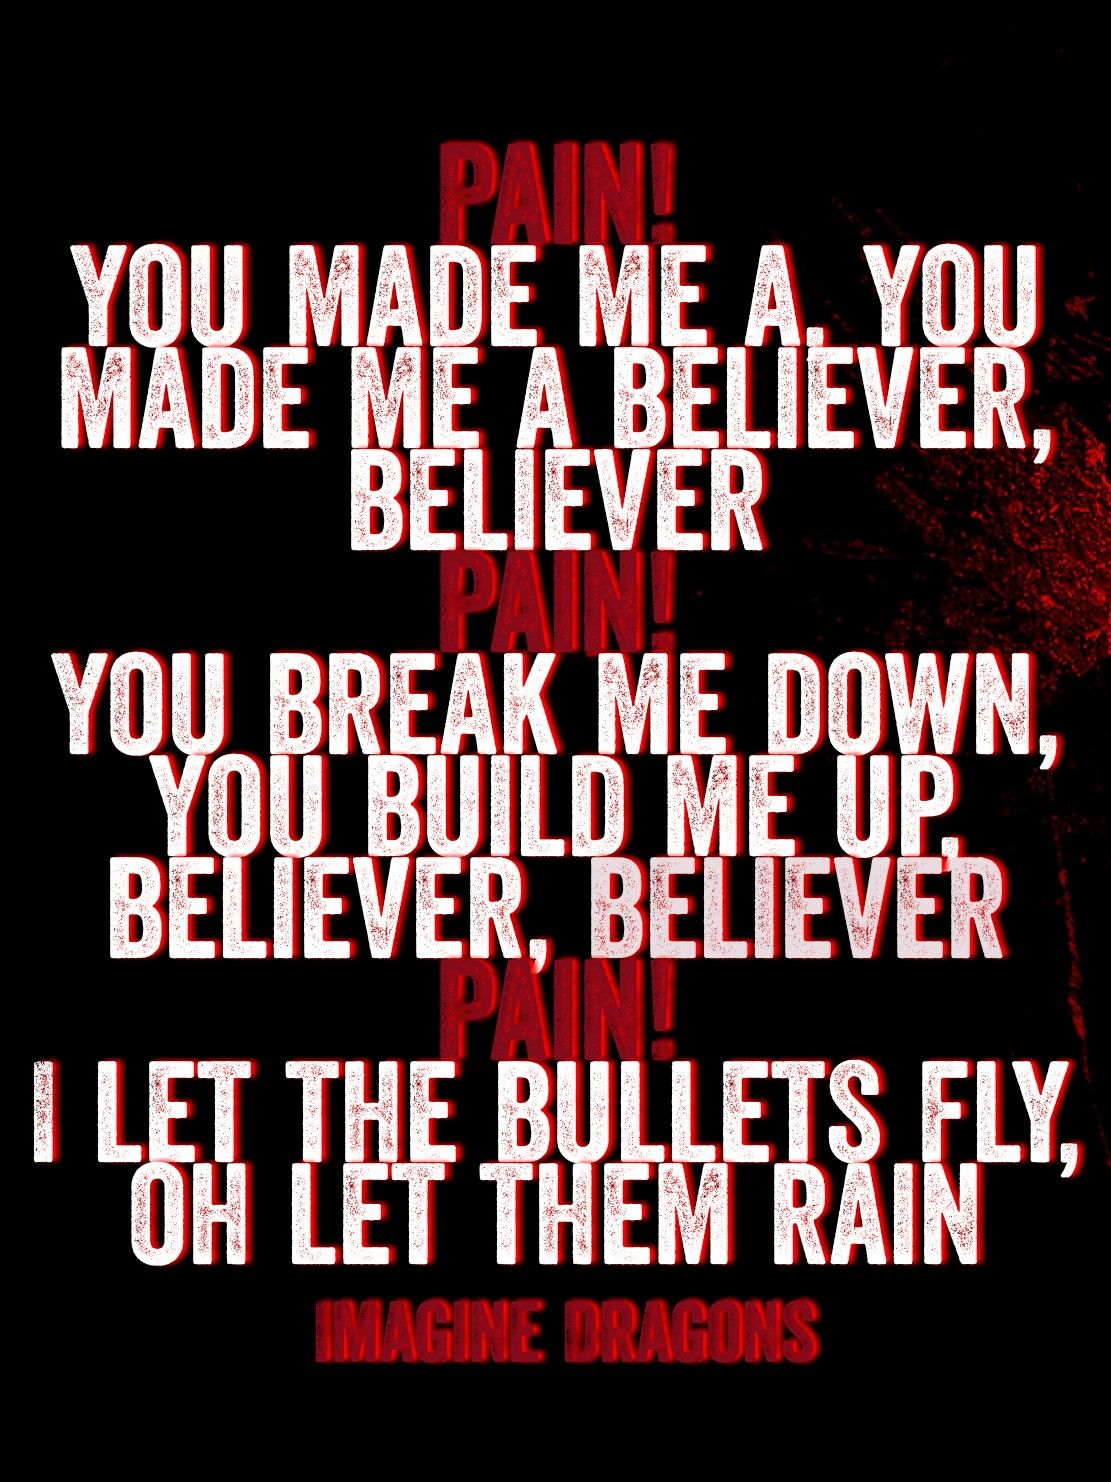 Imagine Dragons Believer Imagine Dragons Lyrics Imagine Dragons Believer Imagine Dragons